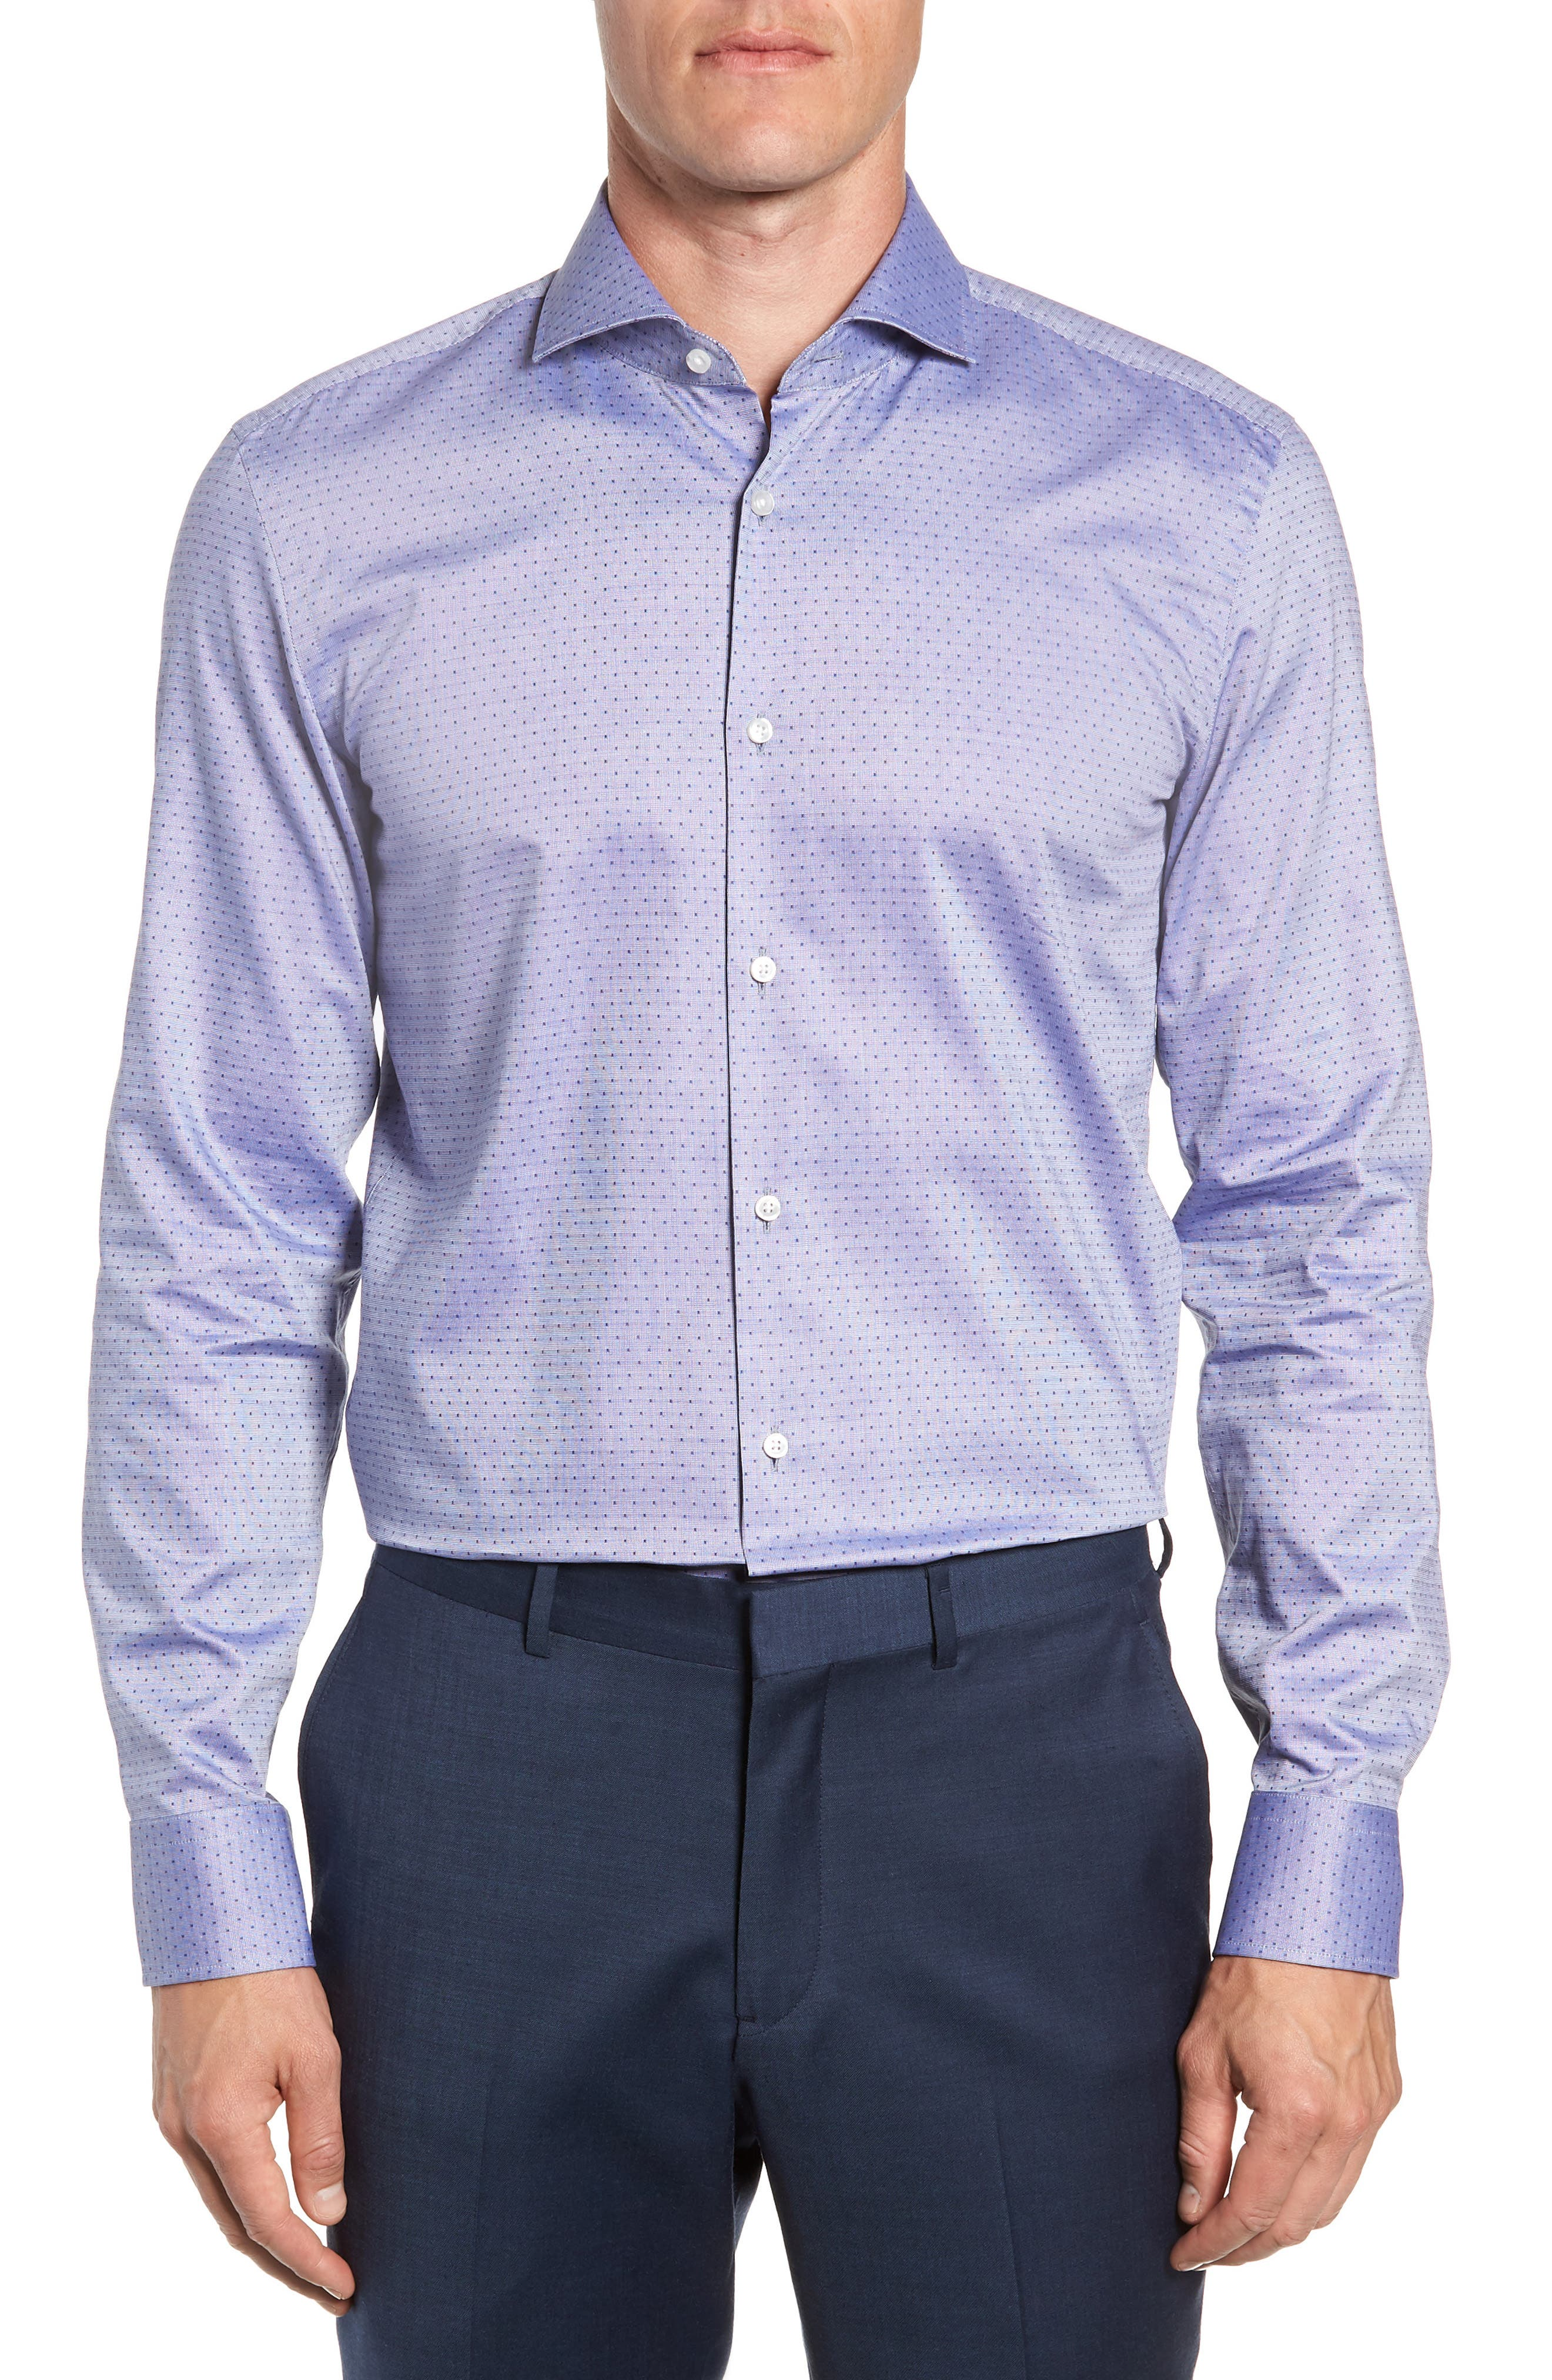 Jason Slim Fit Dot Dress Shirt,                             Main thumbnail 1, color,                             NAVY